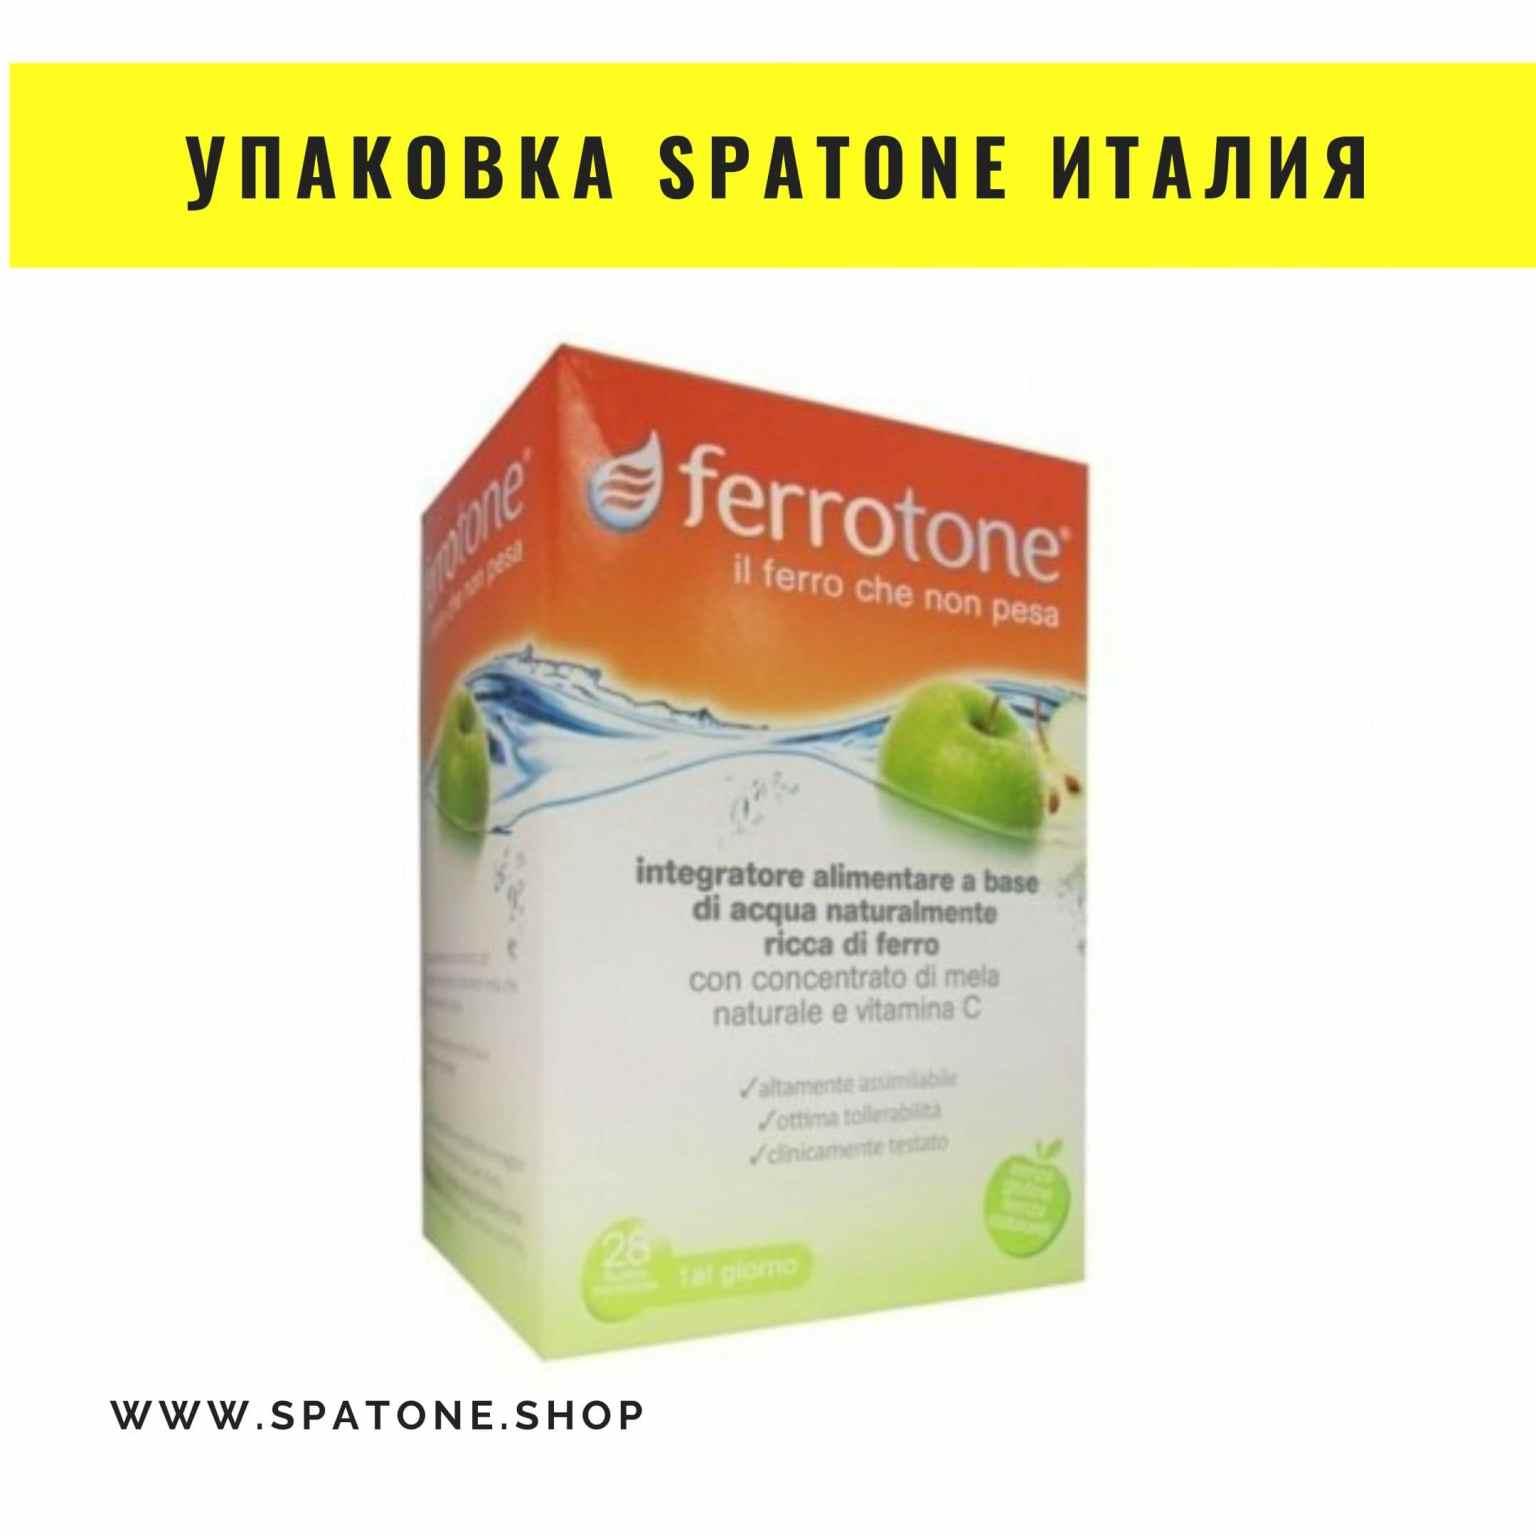 spatone_liquid_iron_supplement, Спатон